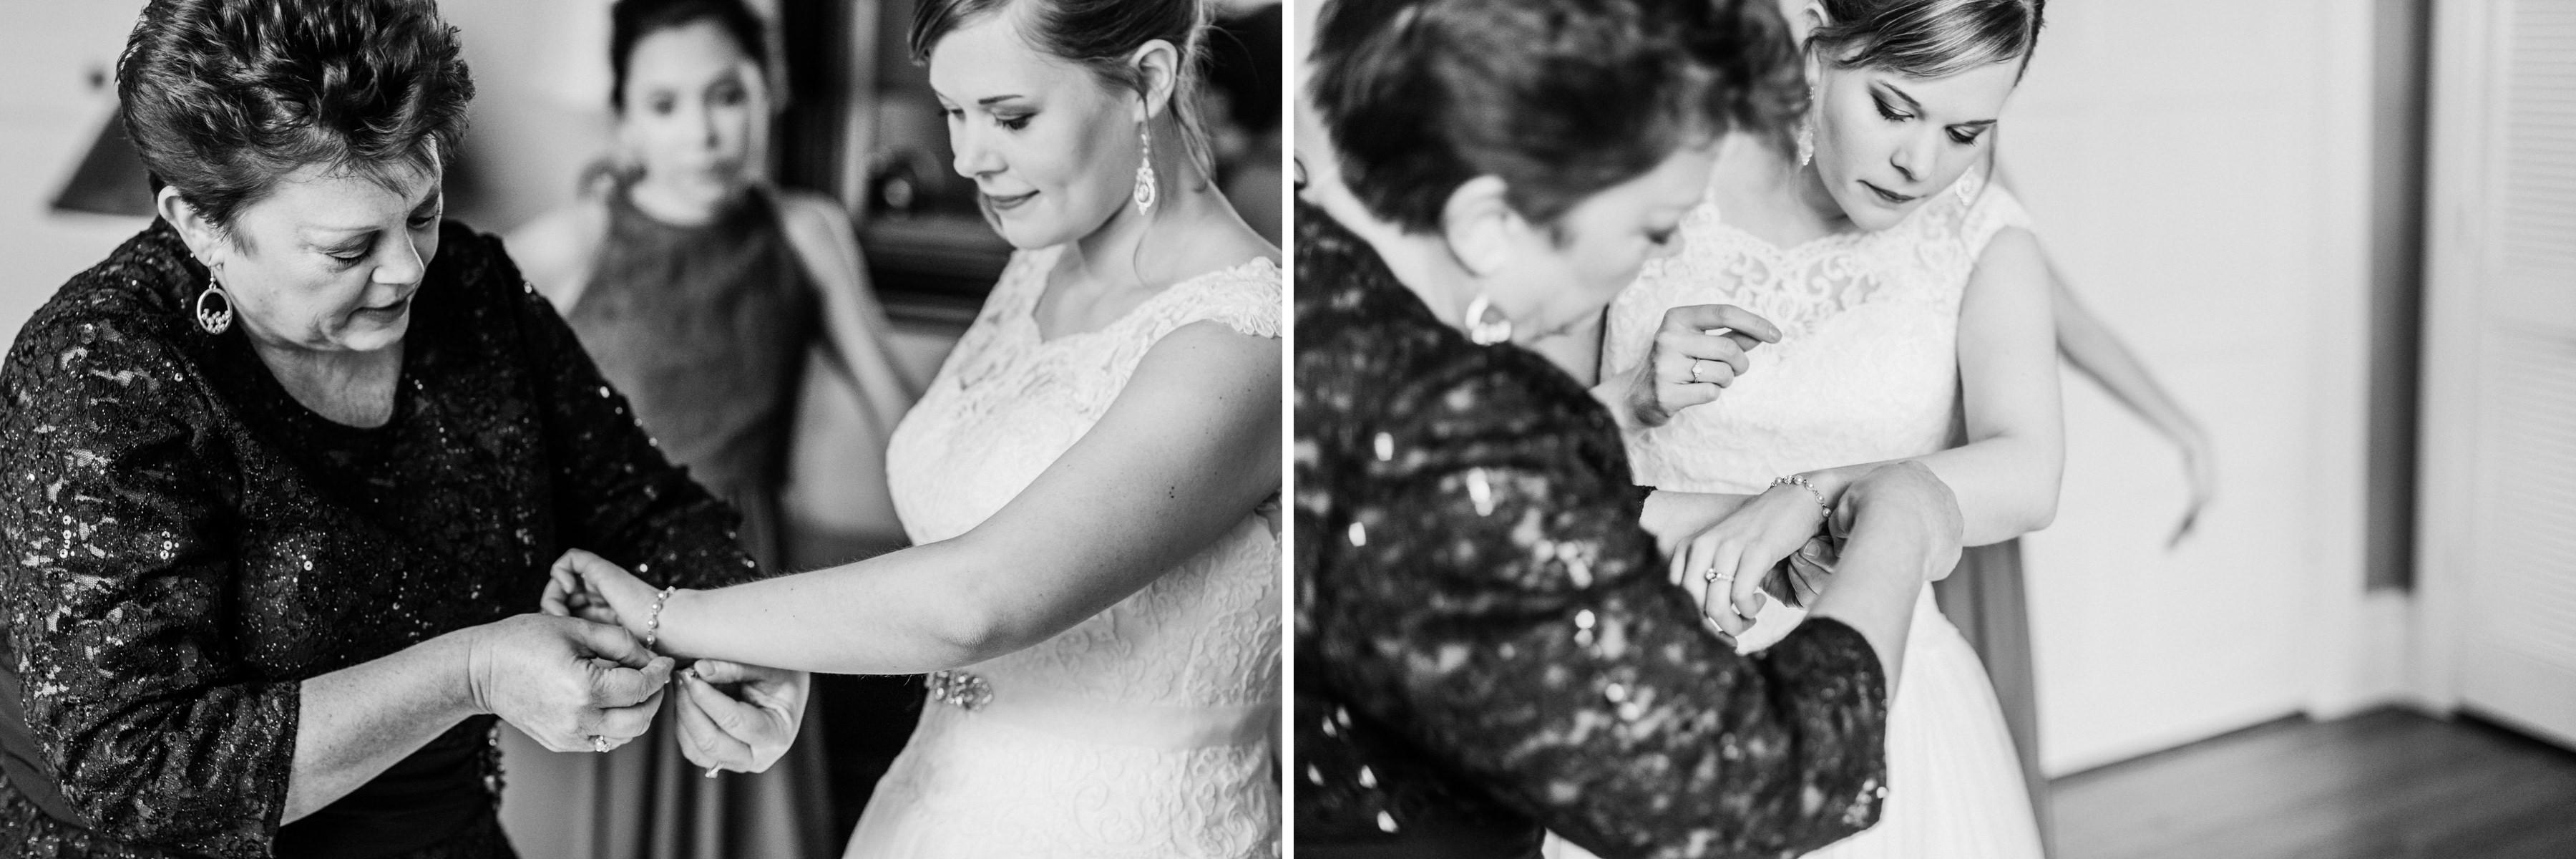 MAULDIN_WEDDING_MONTGOMERY_ALABAMA_WEDDING_PHOTOGRAPHY_22